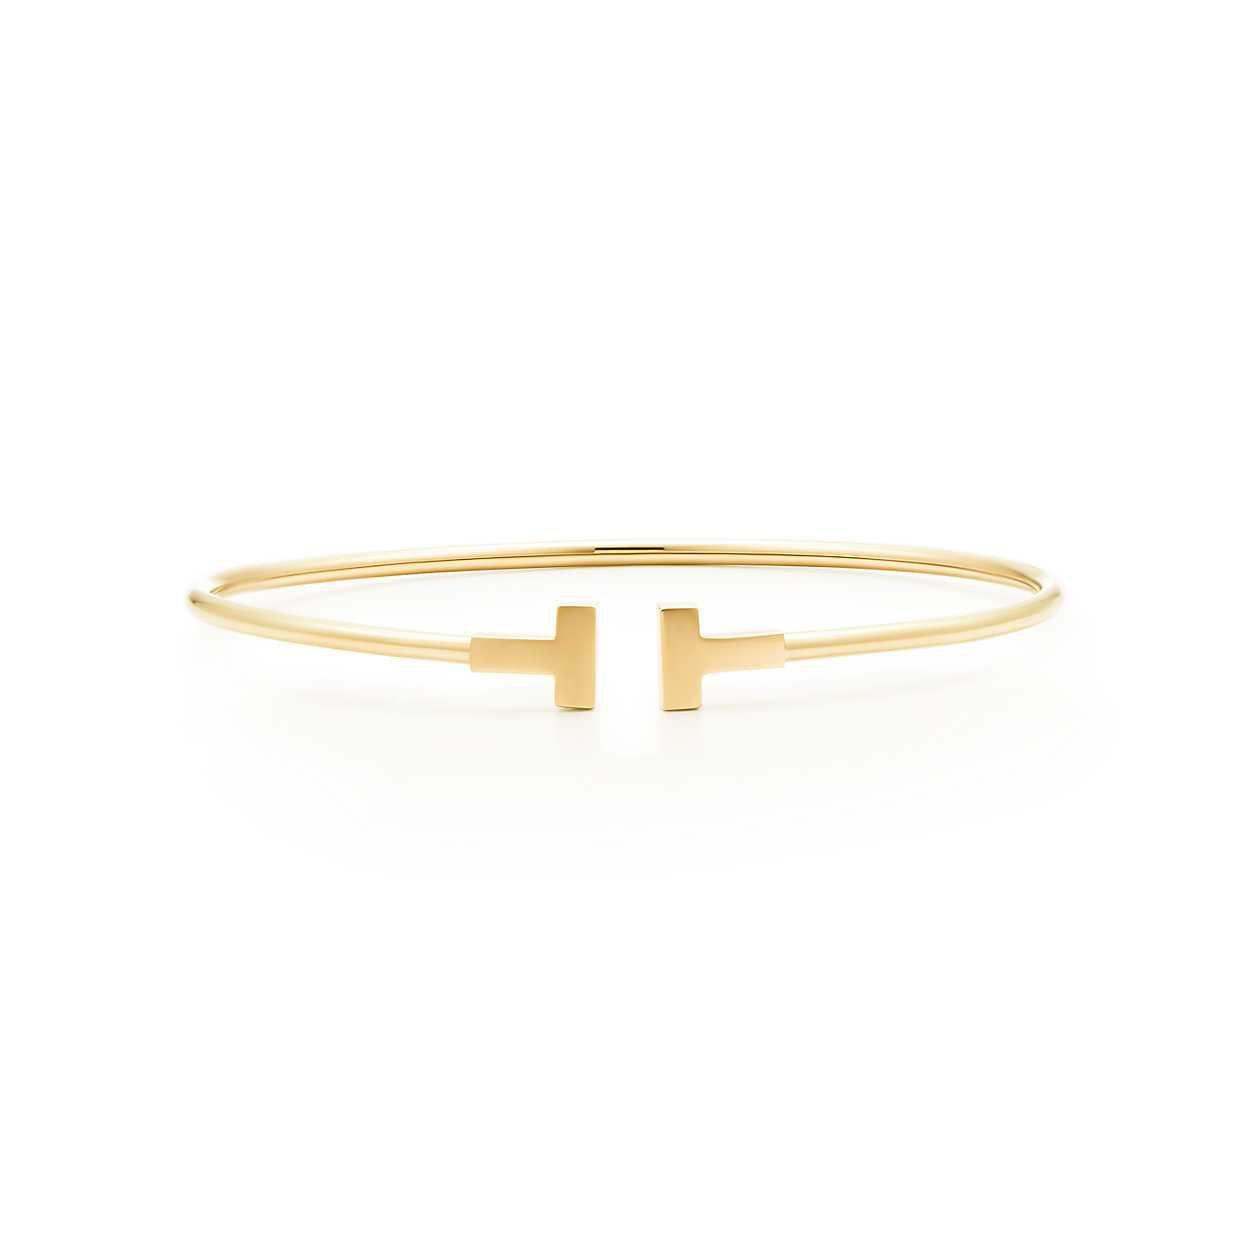 Tiffany T narrow wire bracelet in 18k gold, medium. | Tiffany & Co.